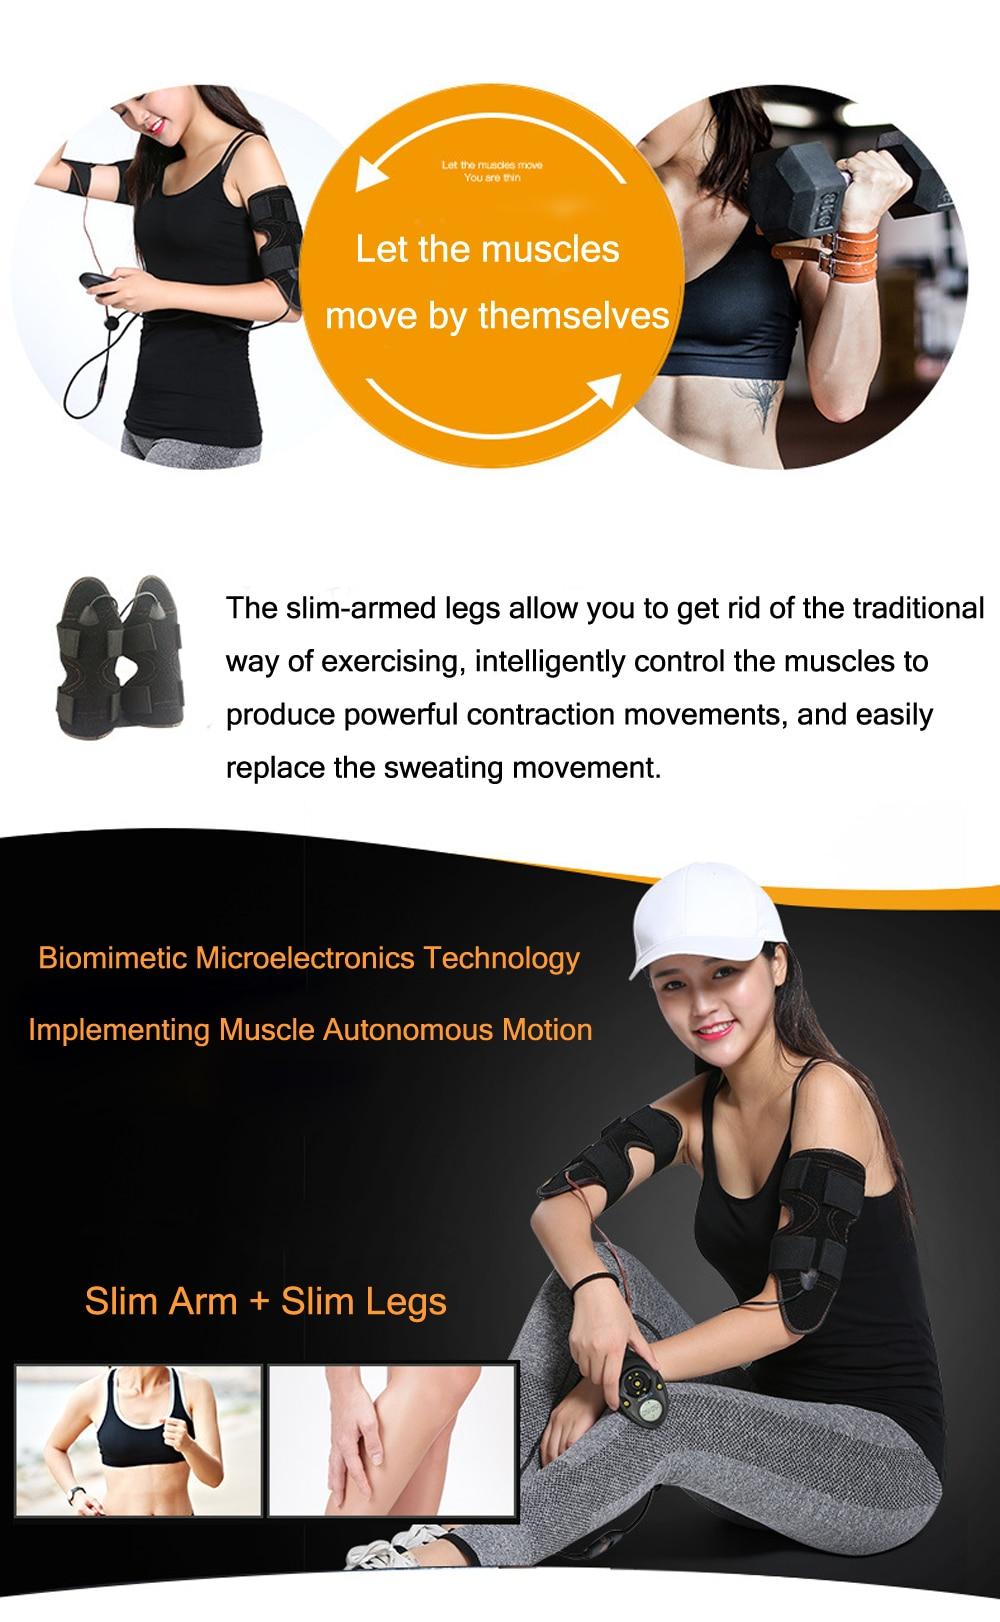 Electric EMS Muscle Stimulator Arm Thigh Fitness Belt Calf Slimming Electrostimulator Lose Weight Bodybuilding Massage Machine